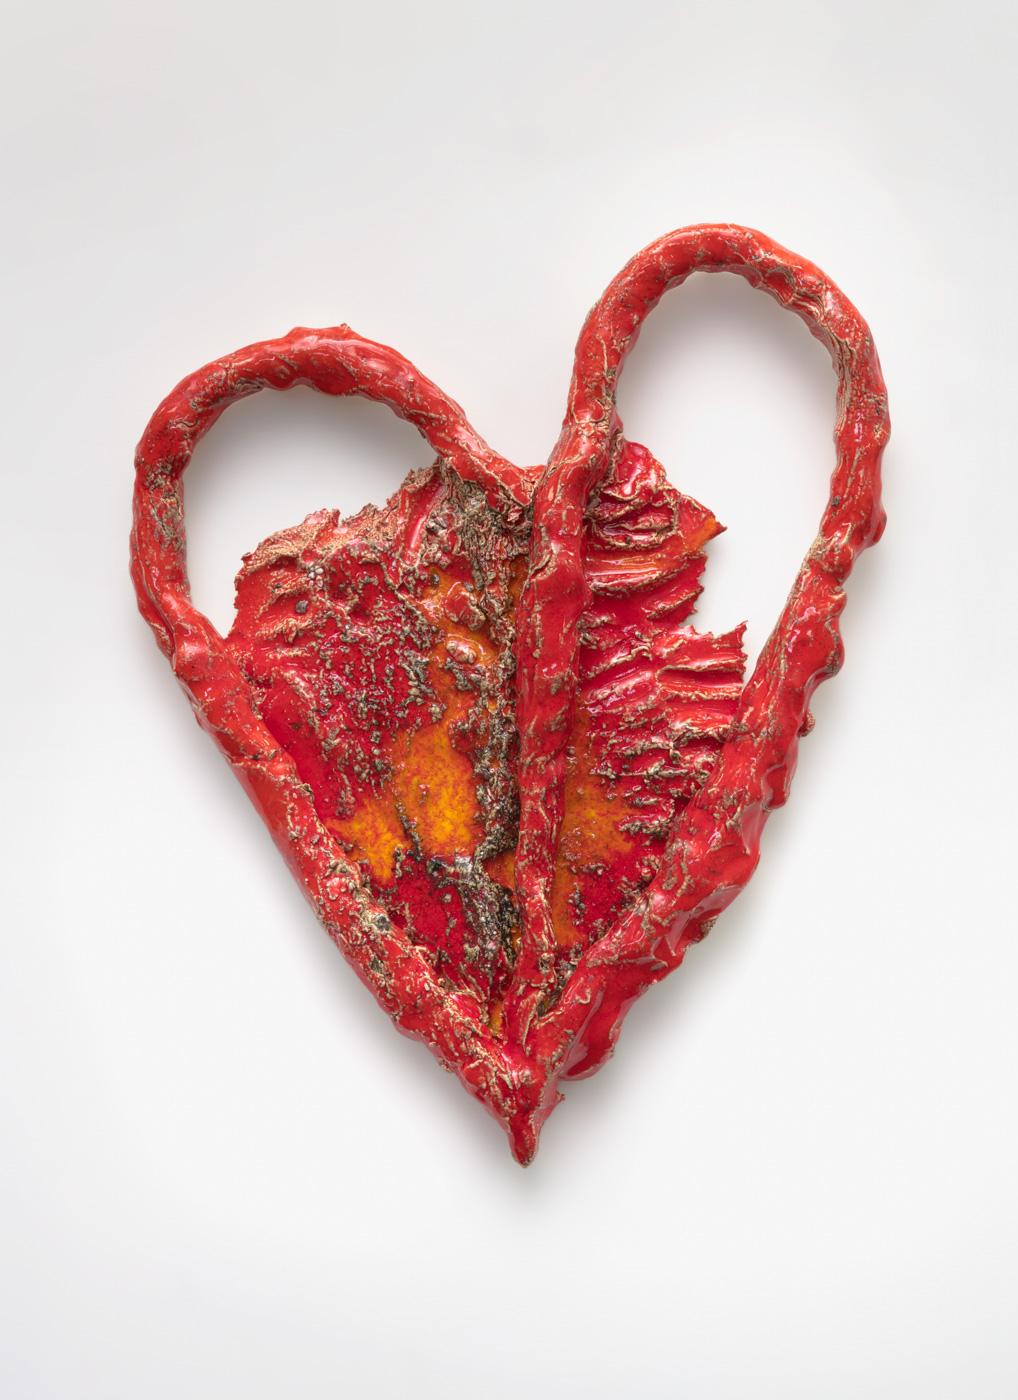 HEART (6633), 2018